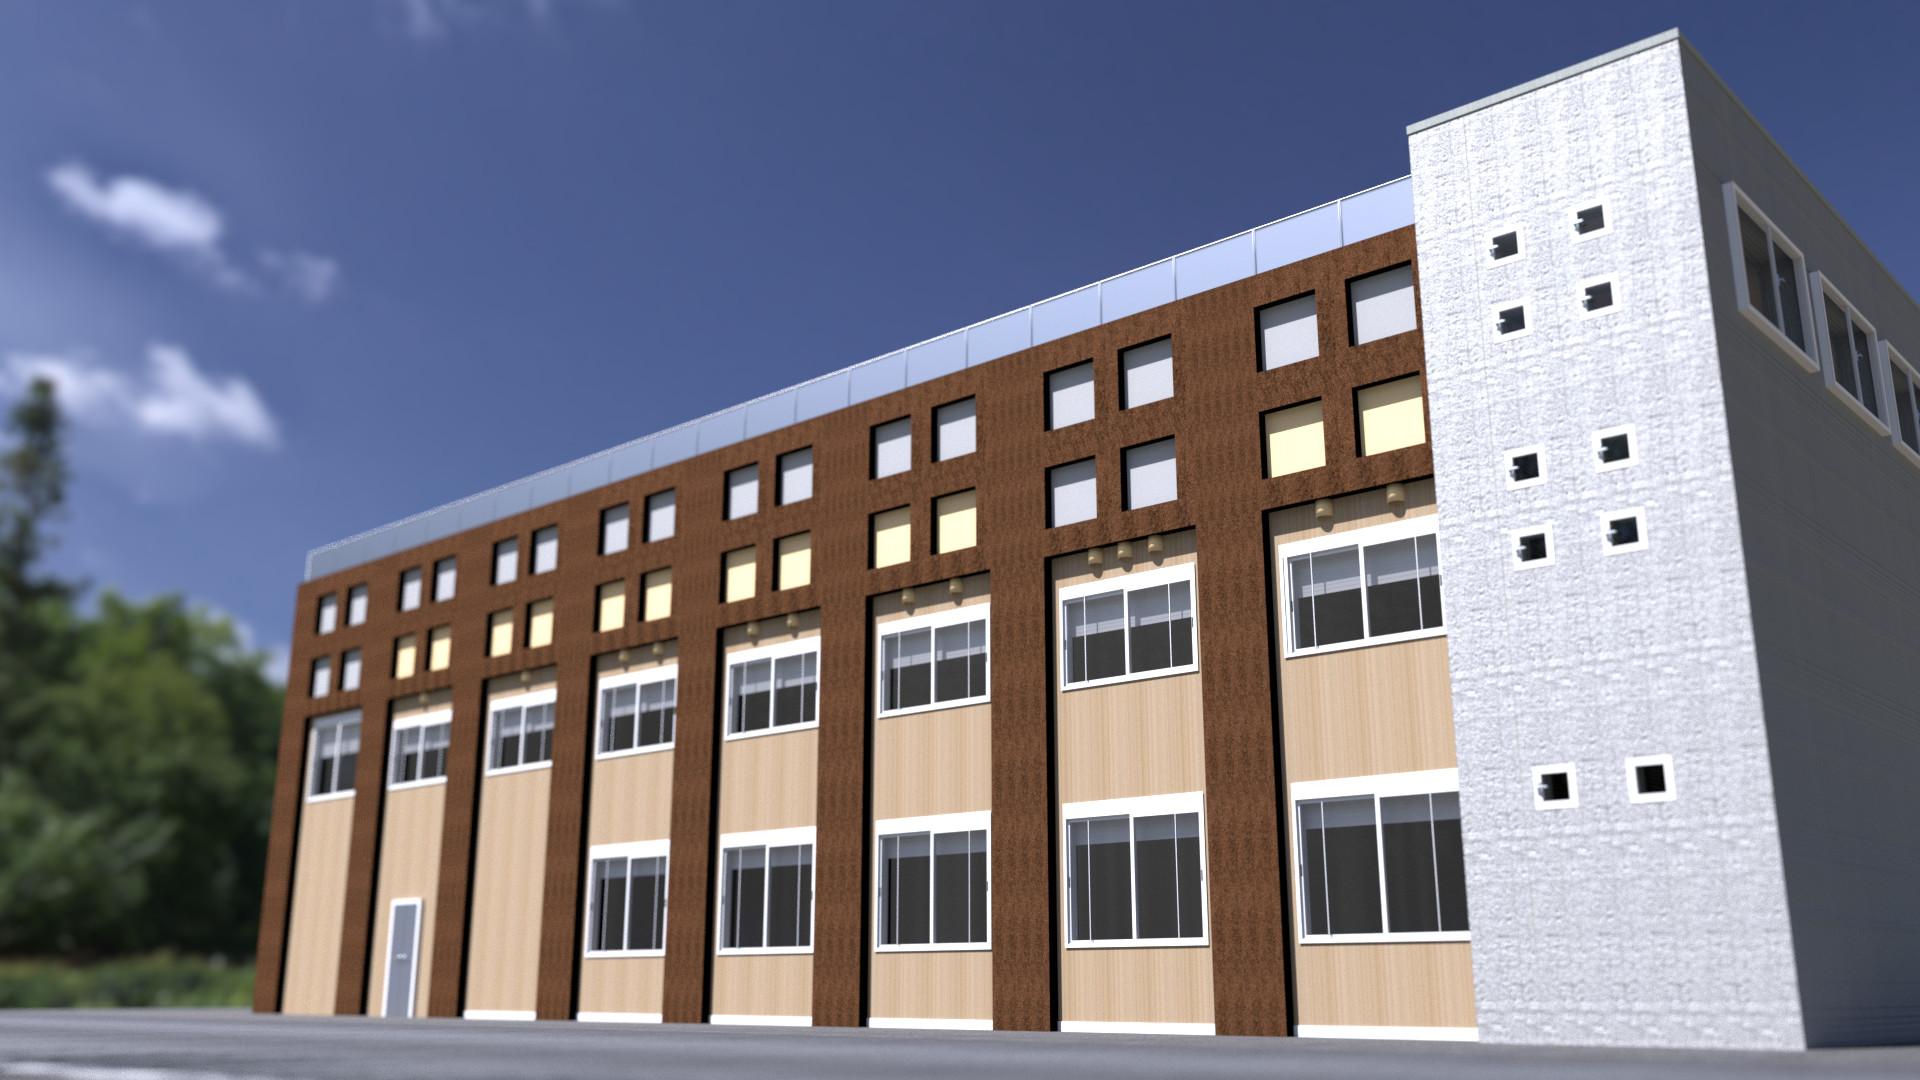 ArtStation - School Building using Blender, Yosuke Inoue